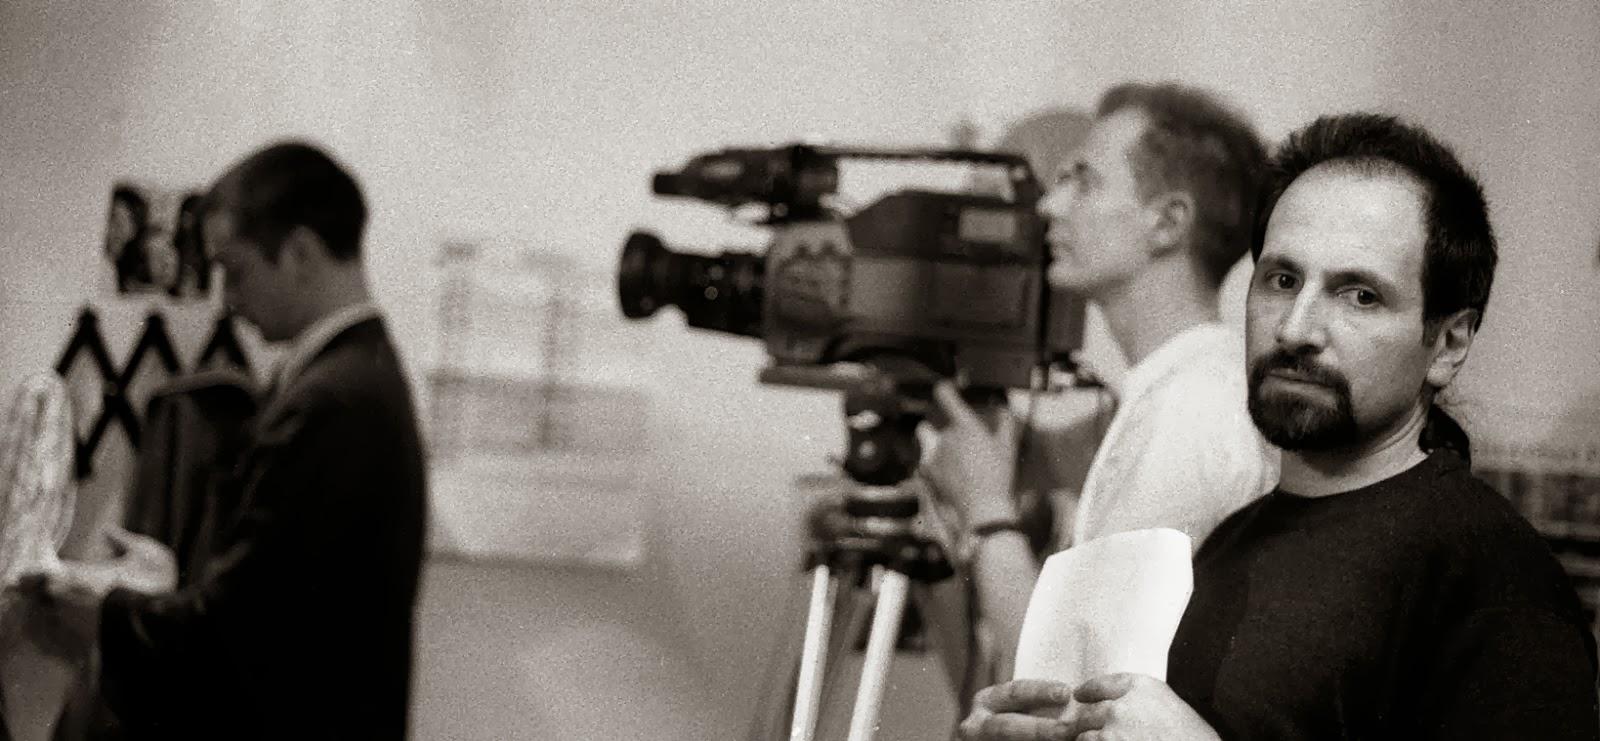 Filmación en FUORICAMPO-MILANO